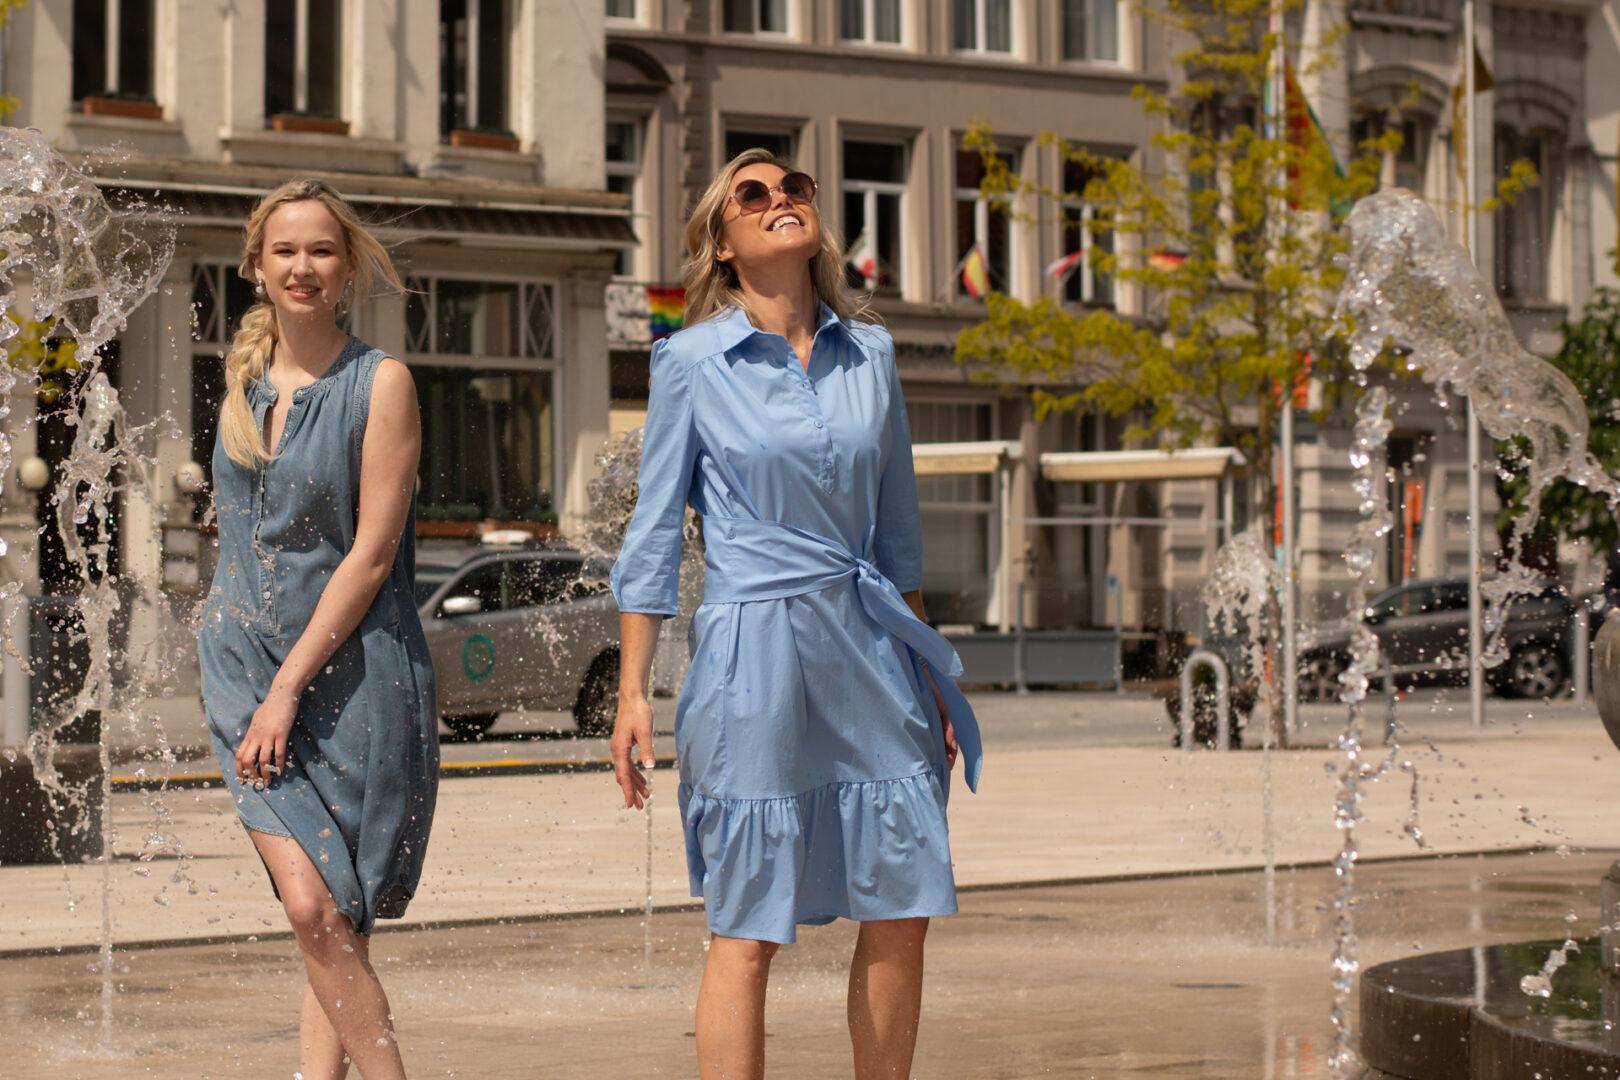 zomerjurk jeans mouwloos gustav lichtblauwe jurk riani tineb oudenaarde damesmode